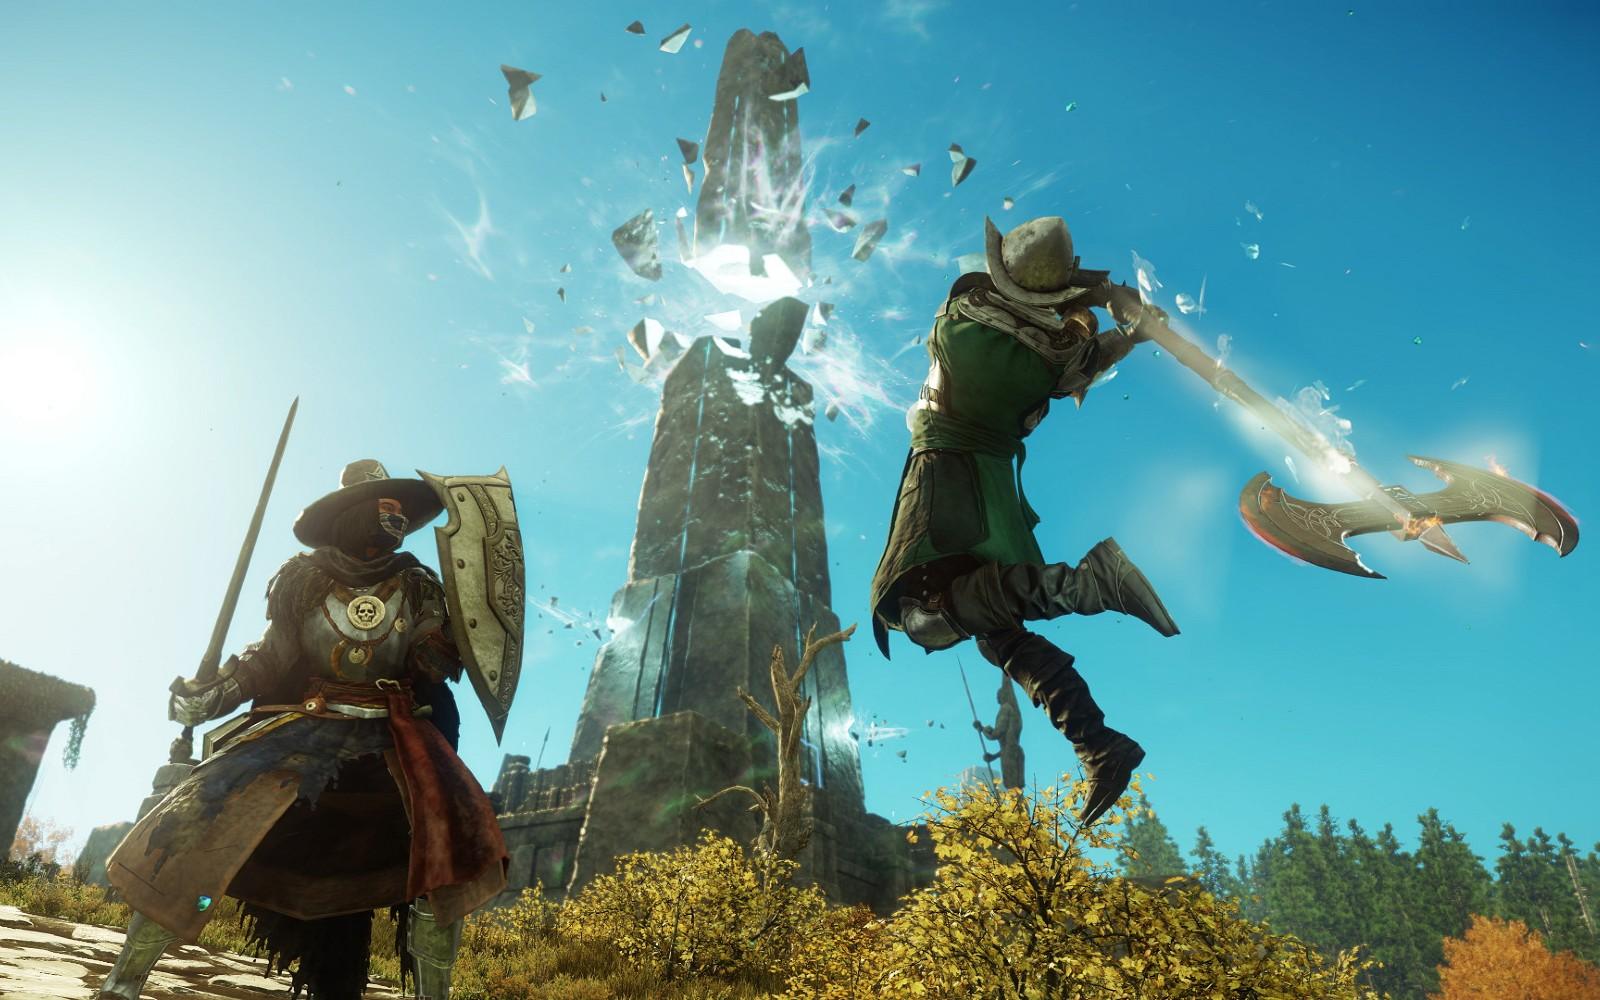 New World установила новый рекорд / фото Amazon Games